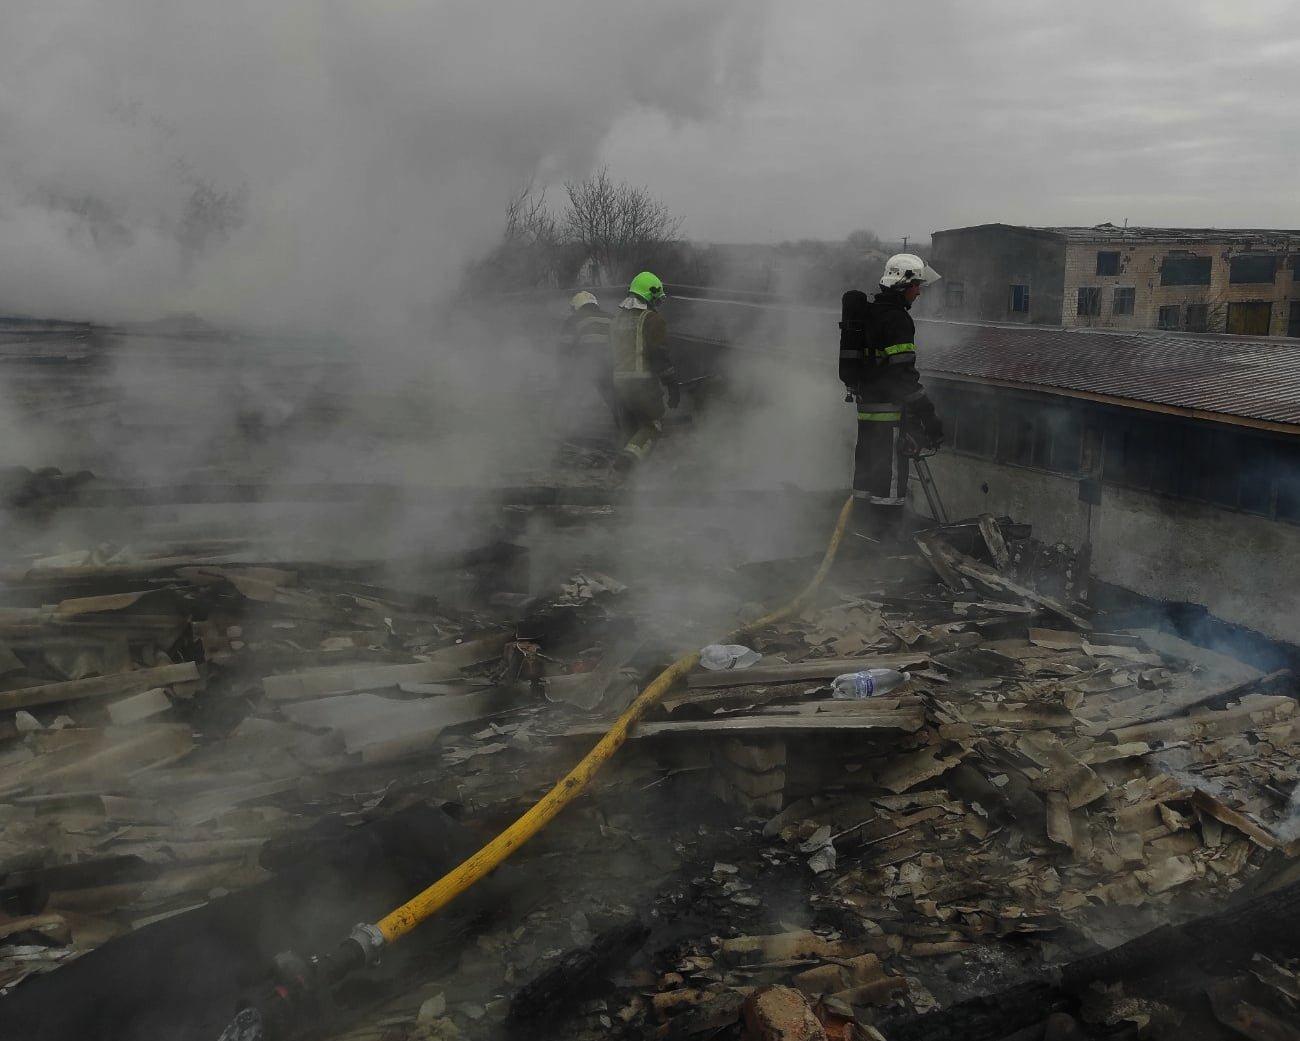 У селі Кам'янка горіла приватна господарча споруда, фото-3